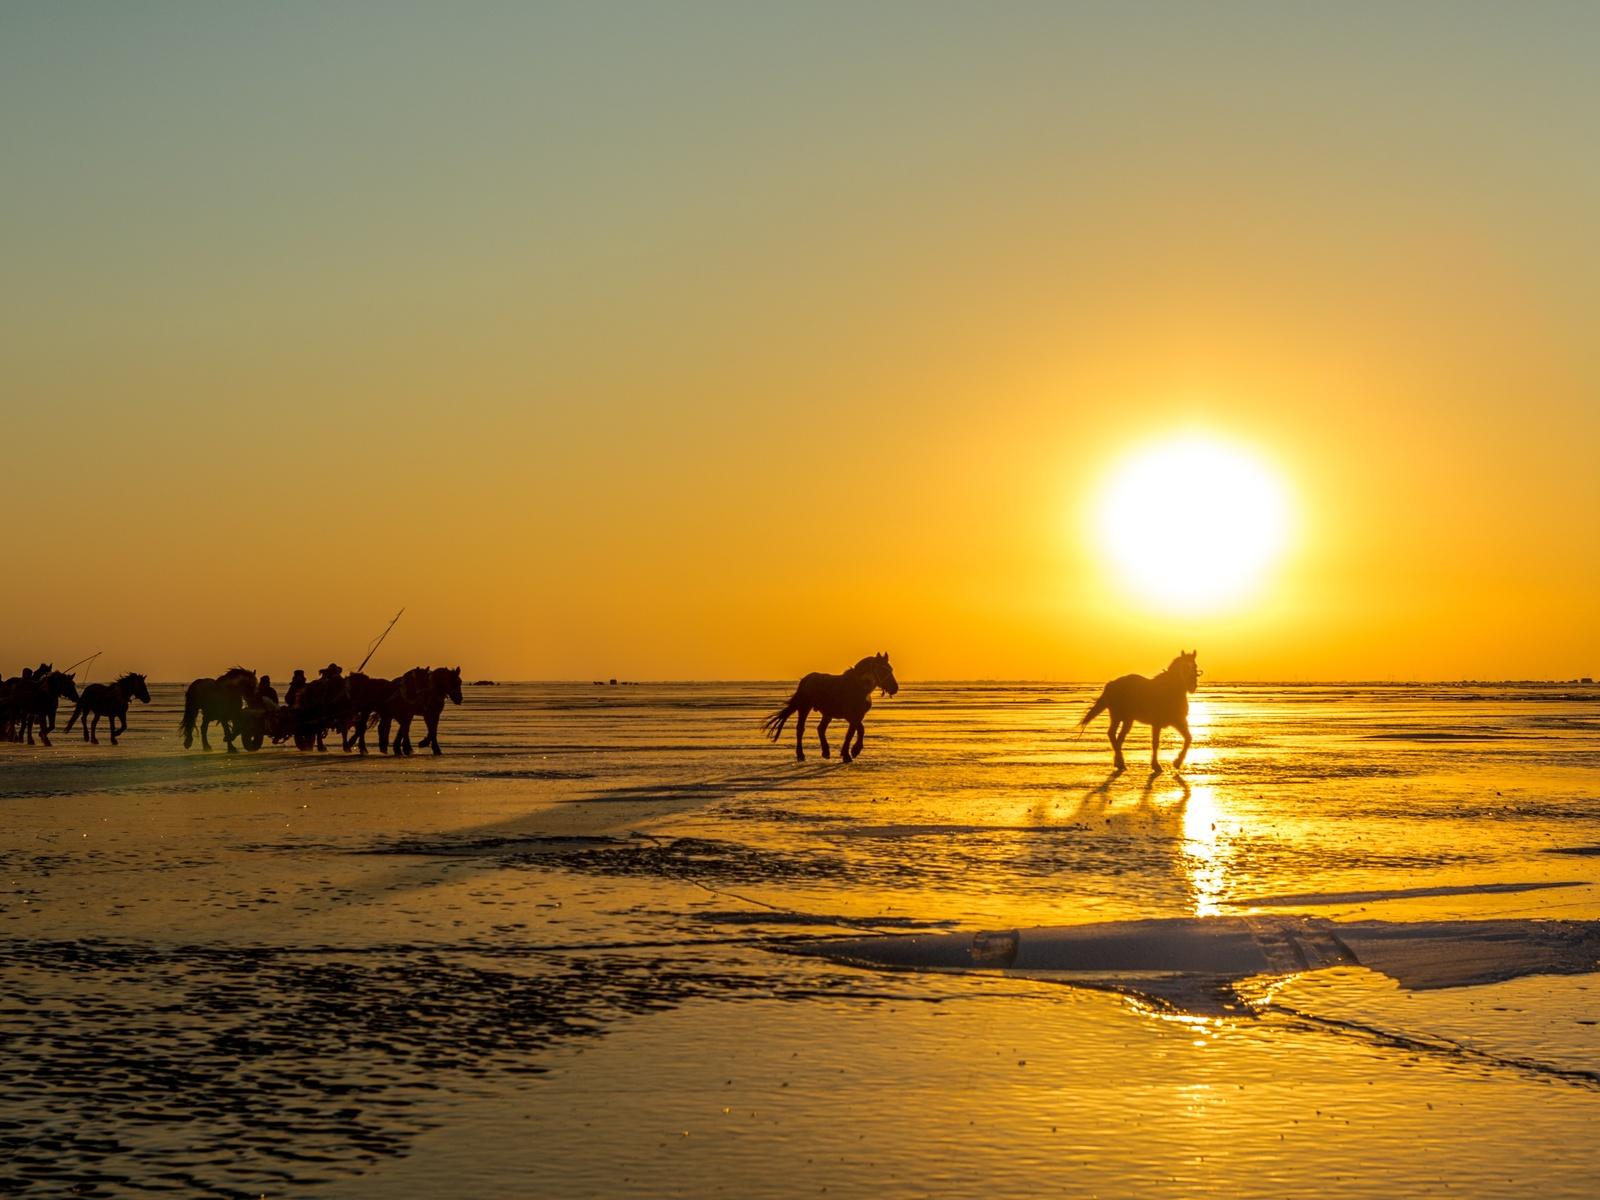 лошади, солнце, снег, животные